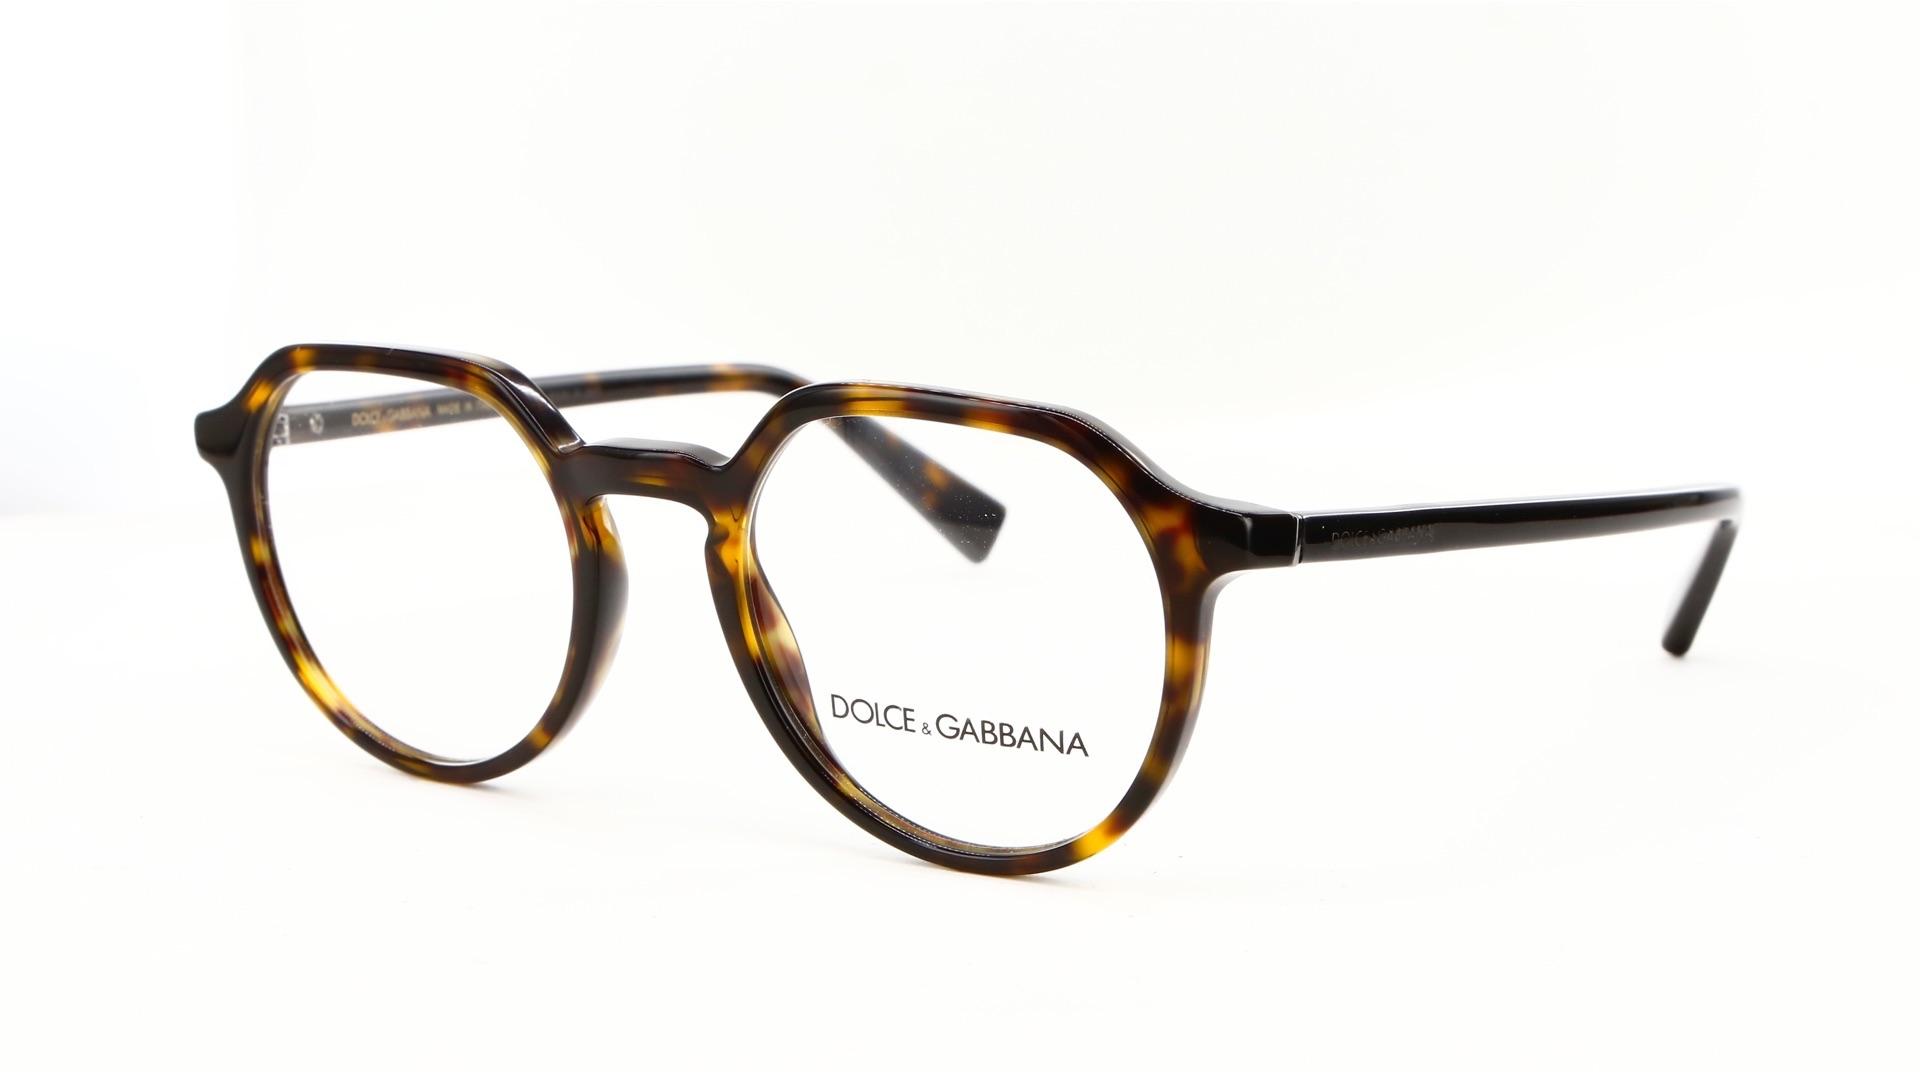 Dolce & Gabbana - ref: 80749